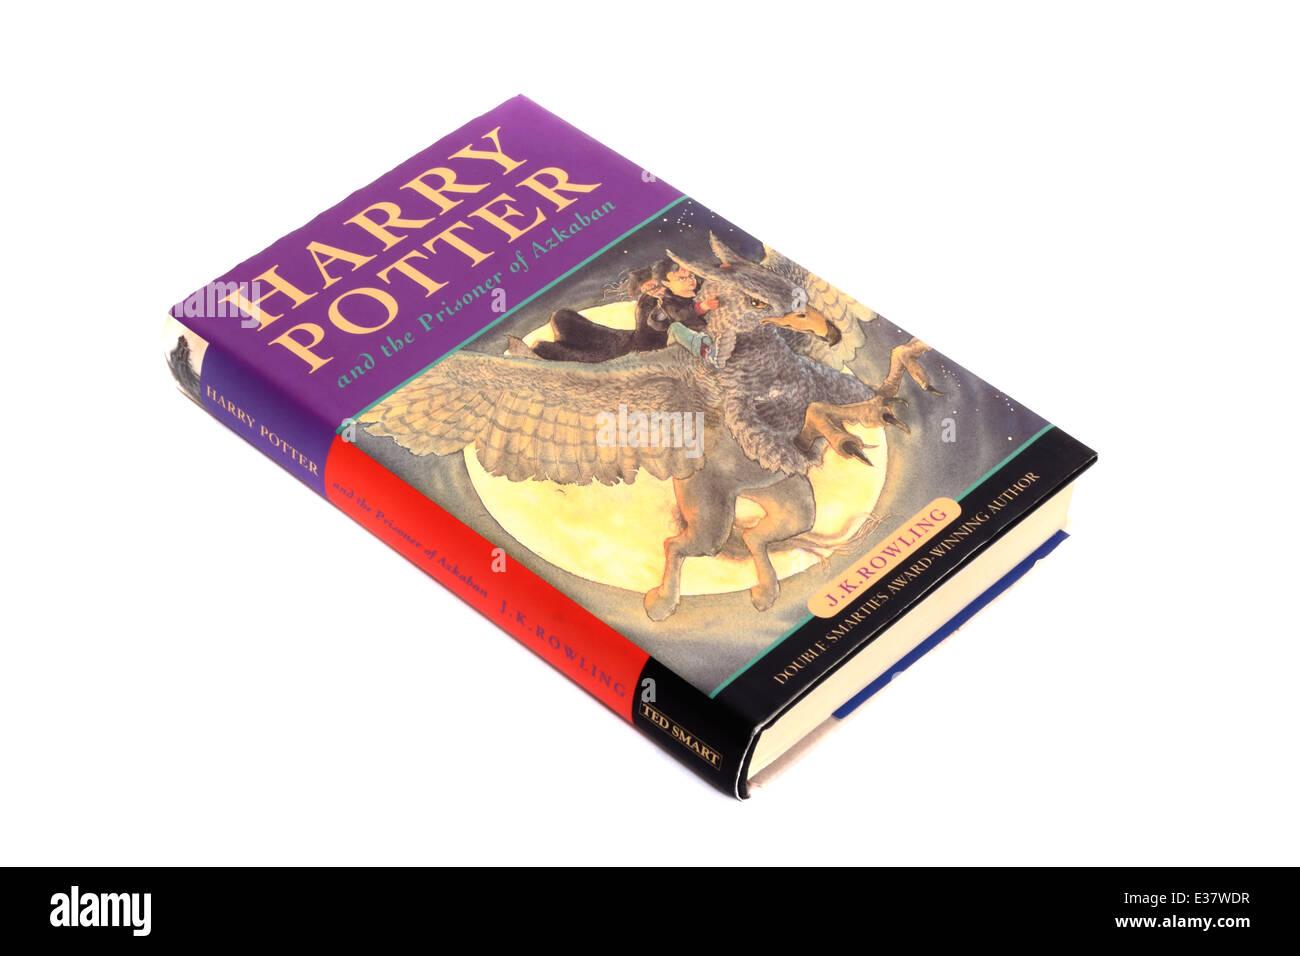 Harry Potter and the Prisoner of Azkaban - Stock Image